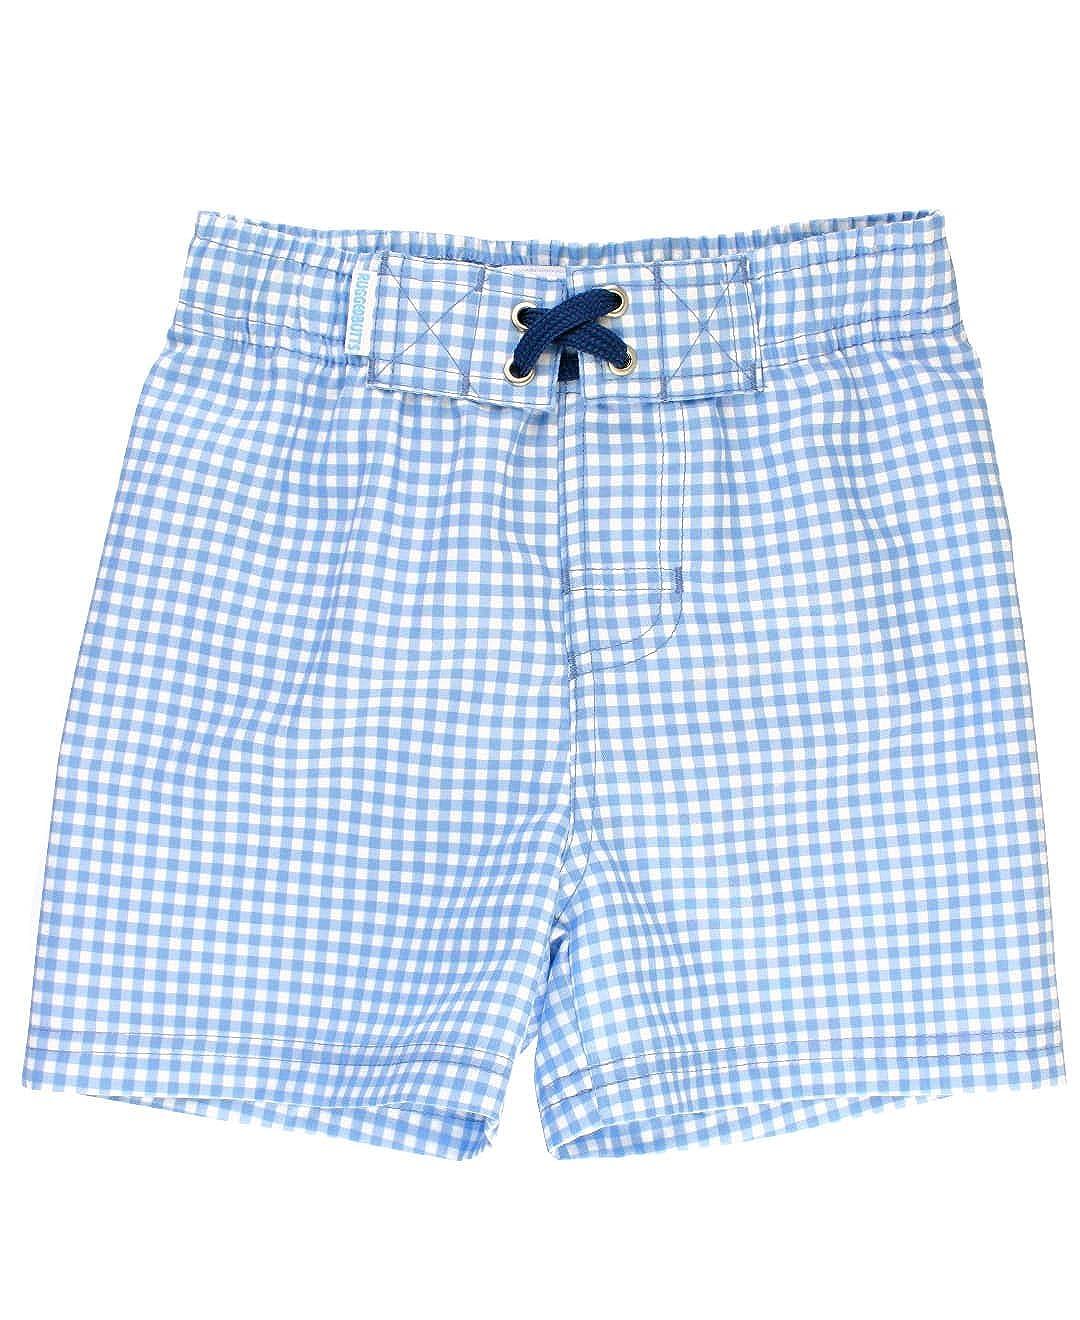 2854e73bc1e0a Amazon.com: RuggedButts Baby/Toddler Boys Swim Trunks w/Adjustable Waist:  Clothing